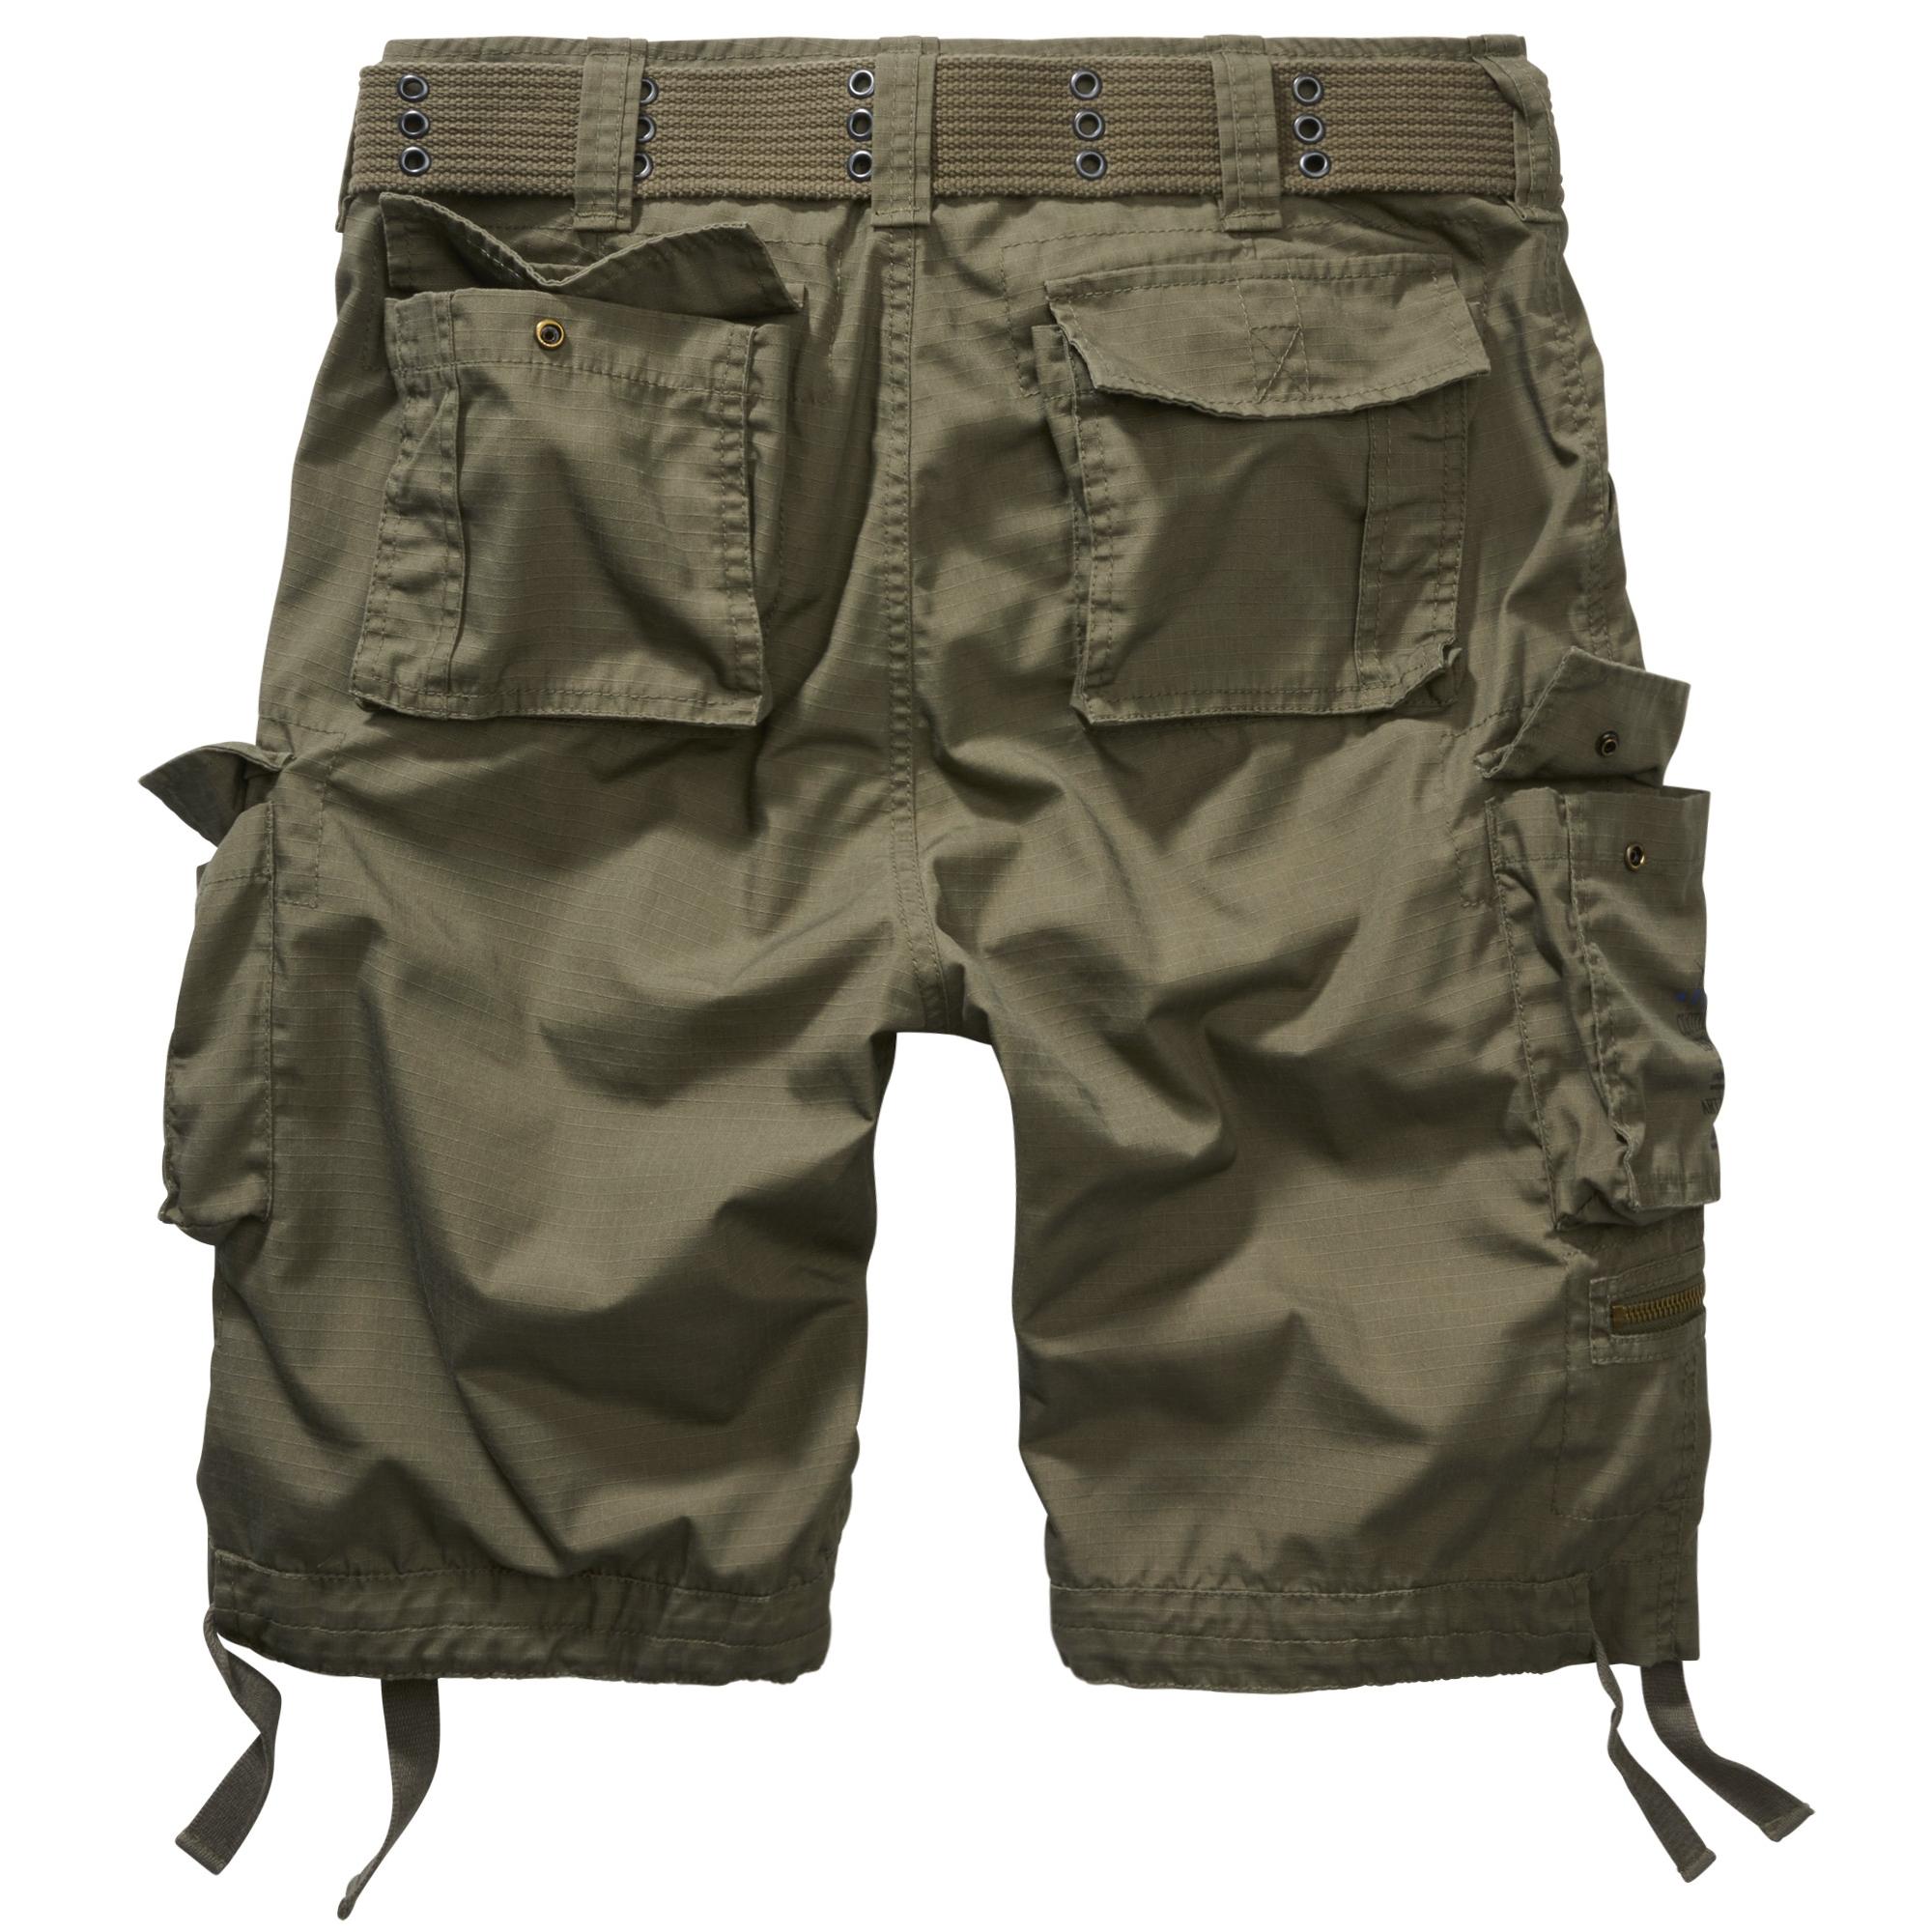 Brandit-Urban-Legend-Herren-Cargo-Shorts-Bermuda-Kurze-Hose-Short-US-Army Indexbild 8